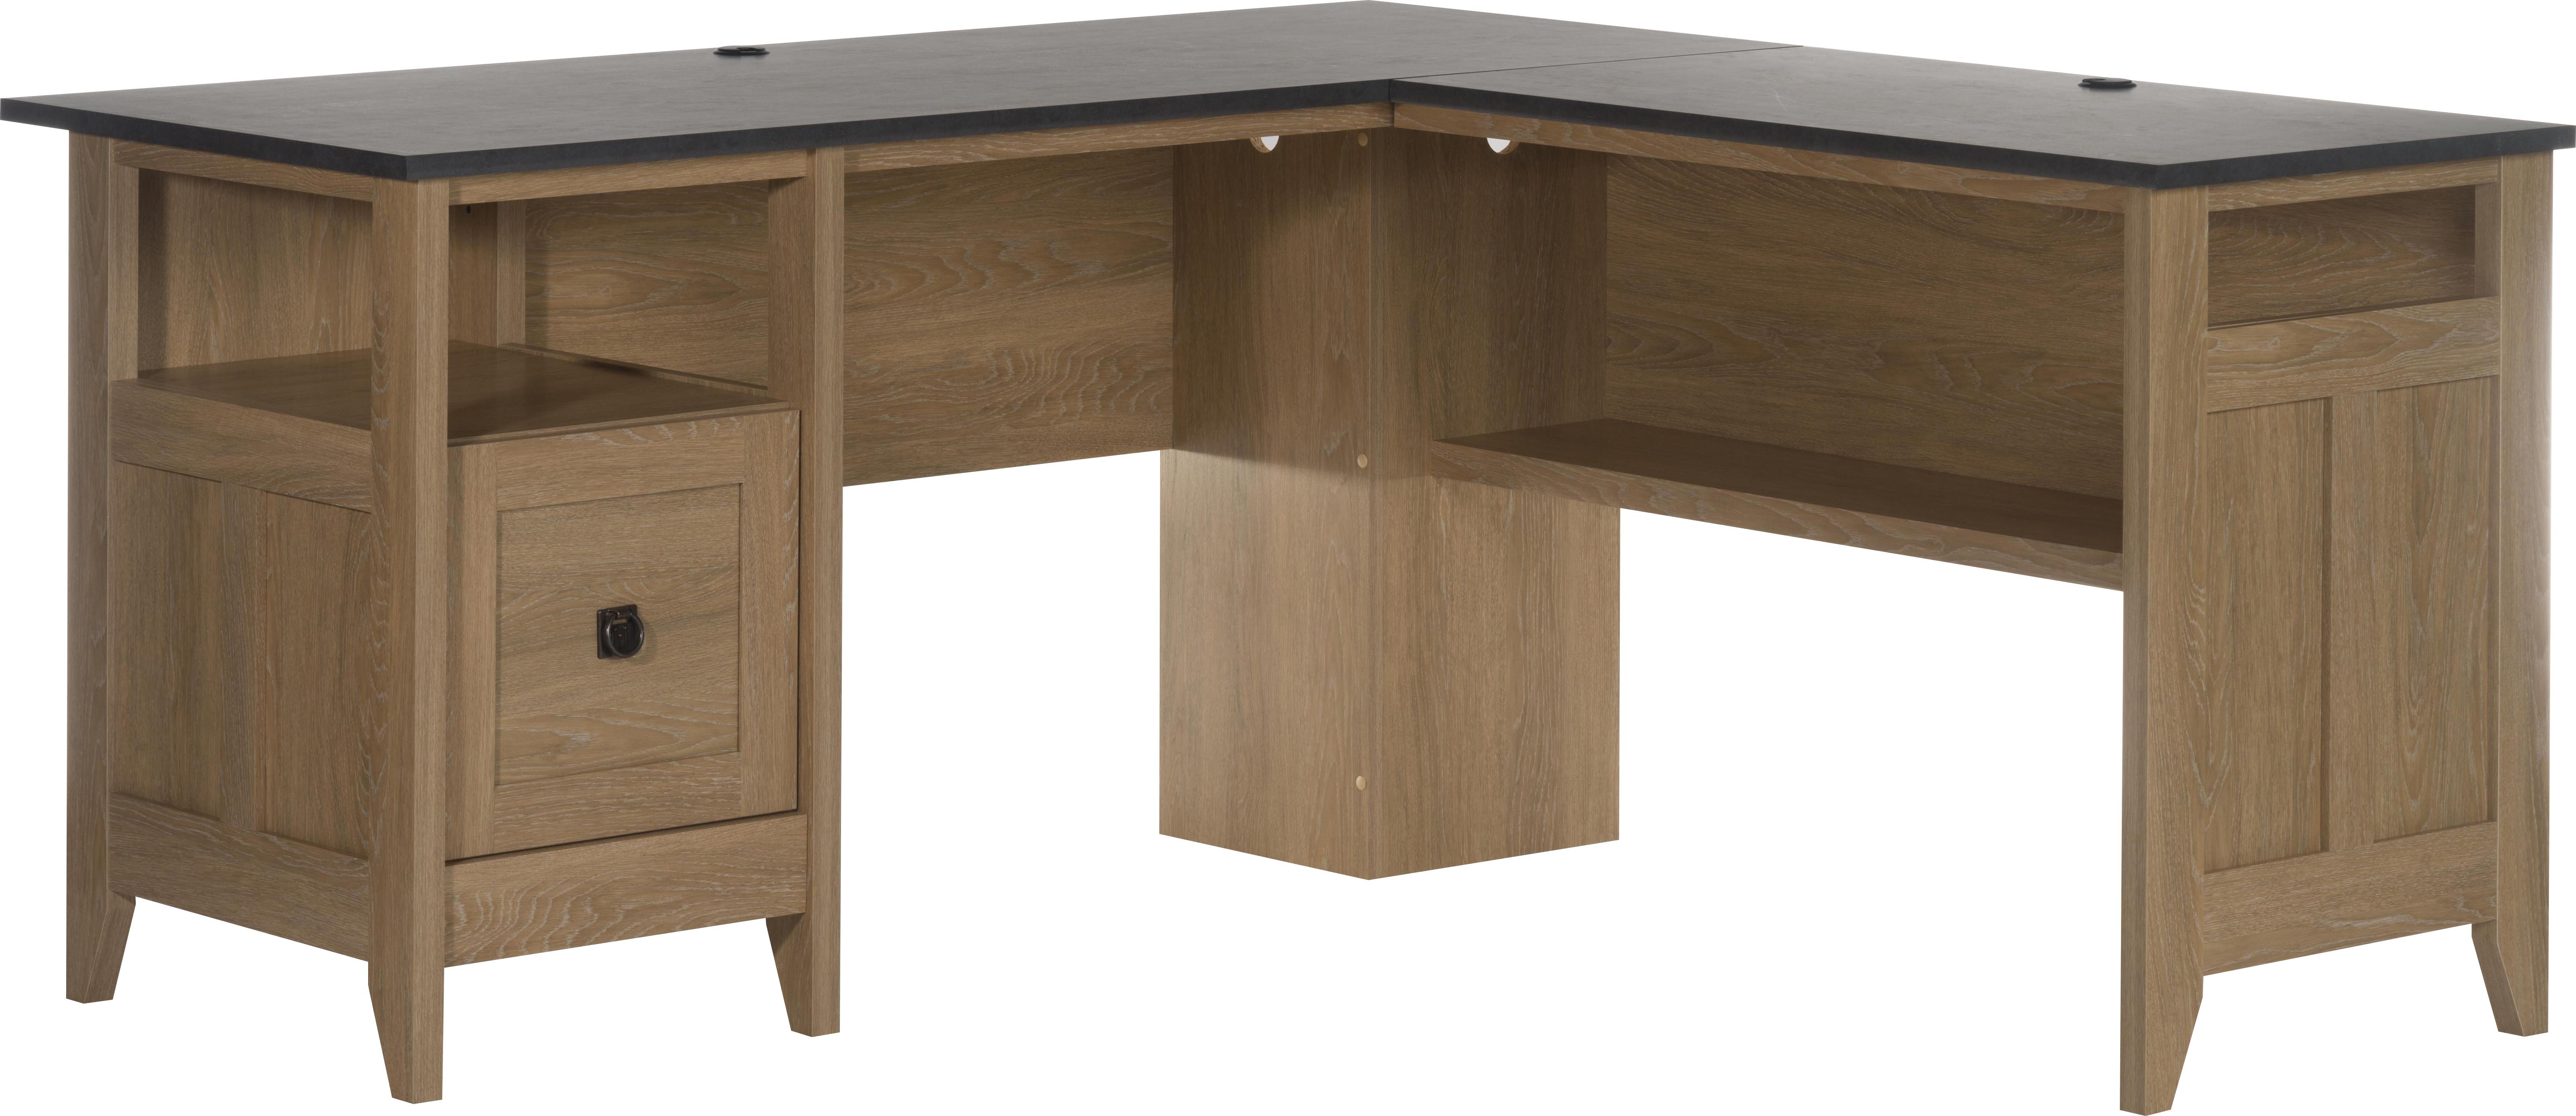 Teknik Office L-Shaped Executive Desk With Dover Oak Finish Stylish Slate Coloured Desktop